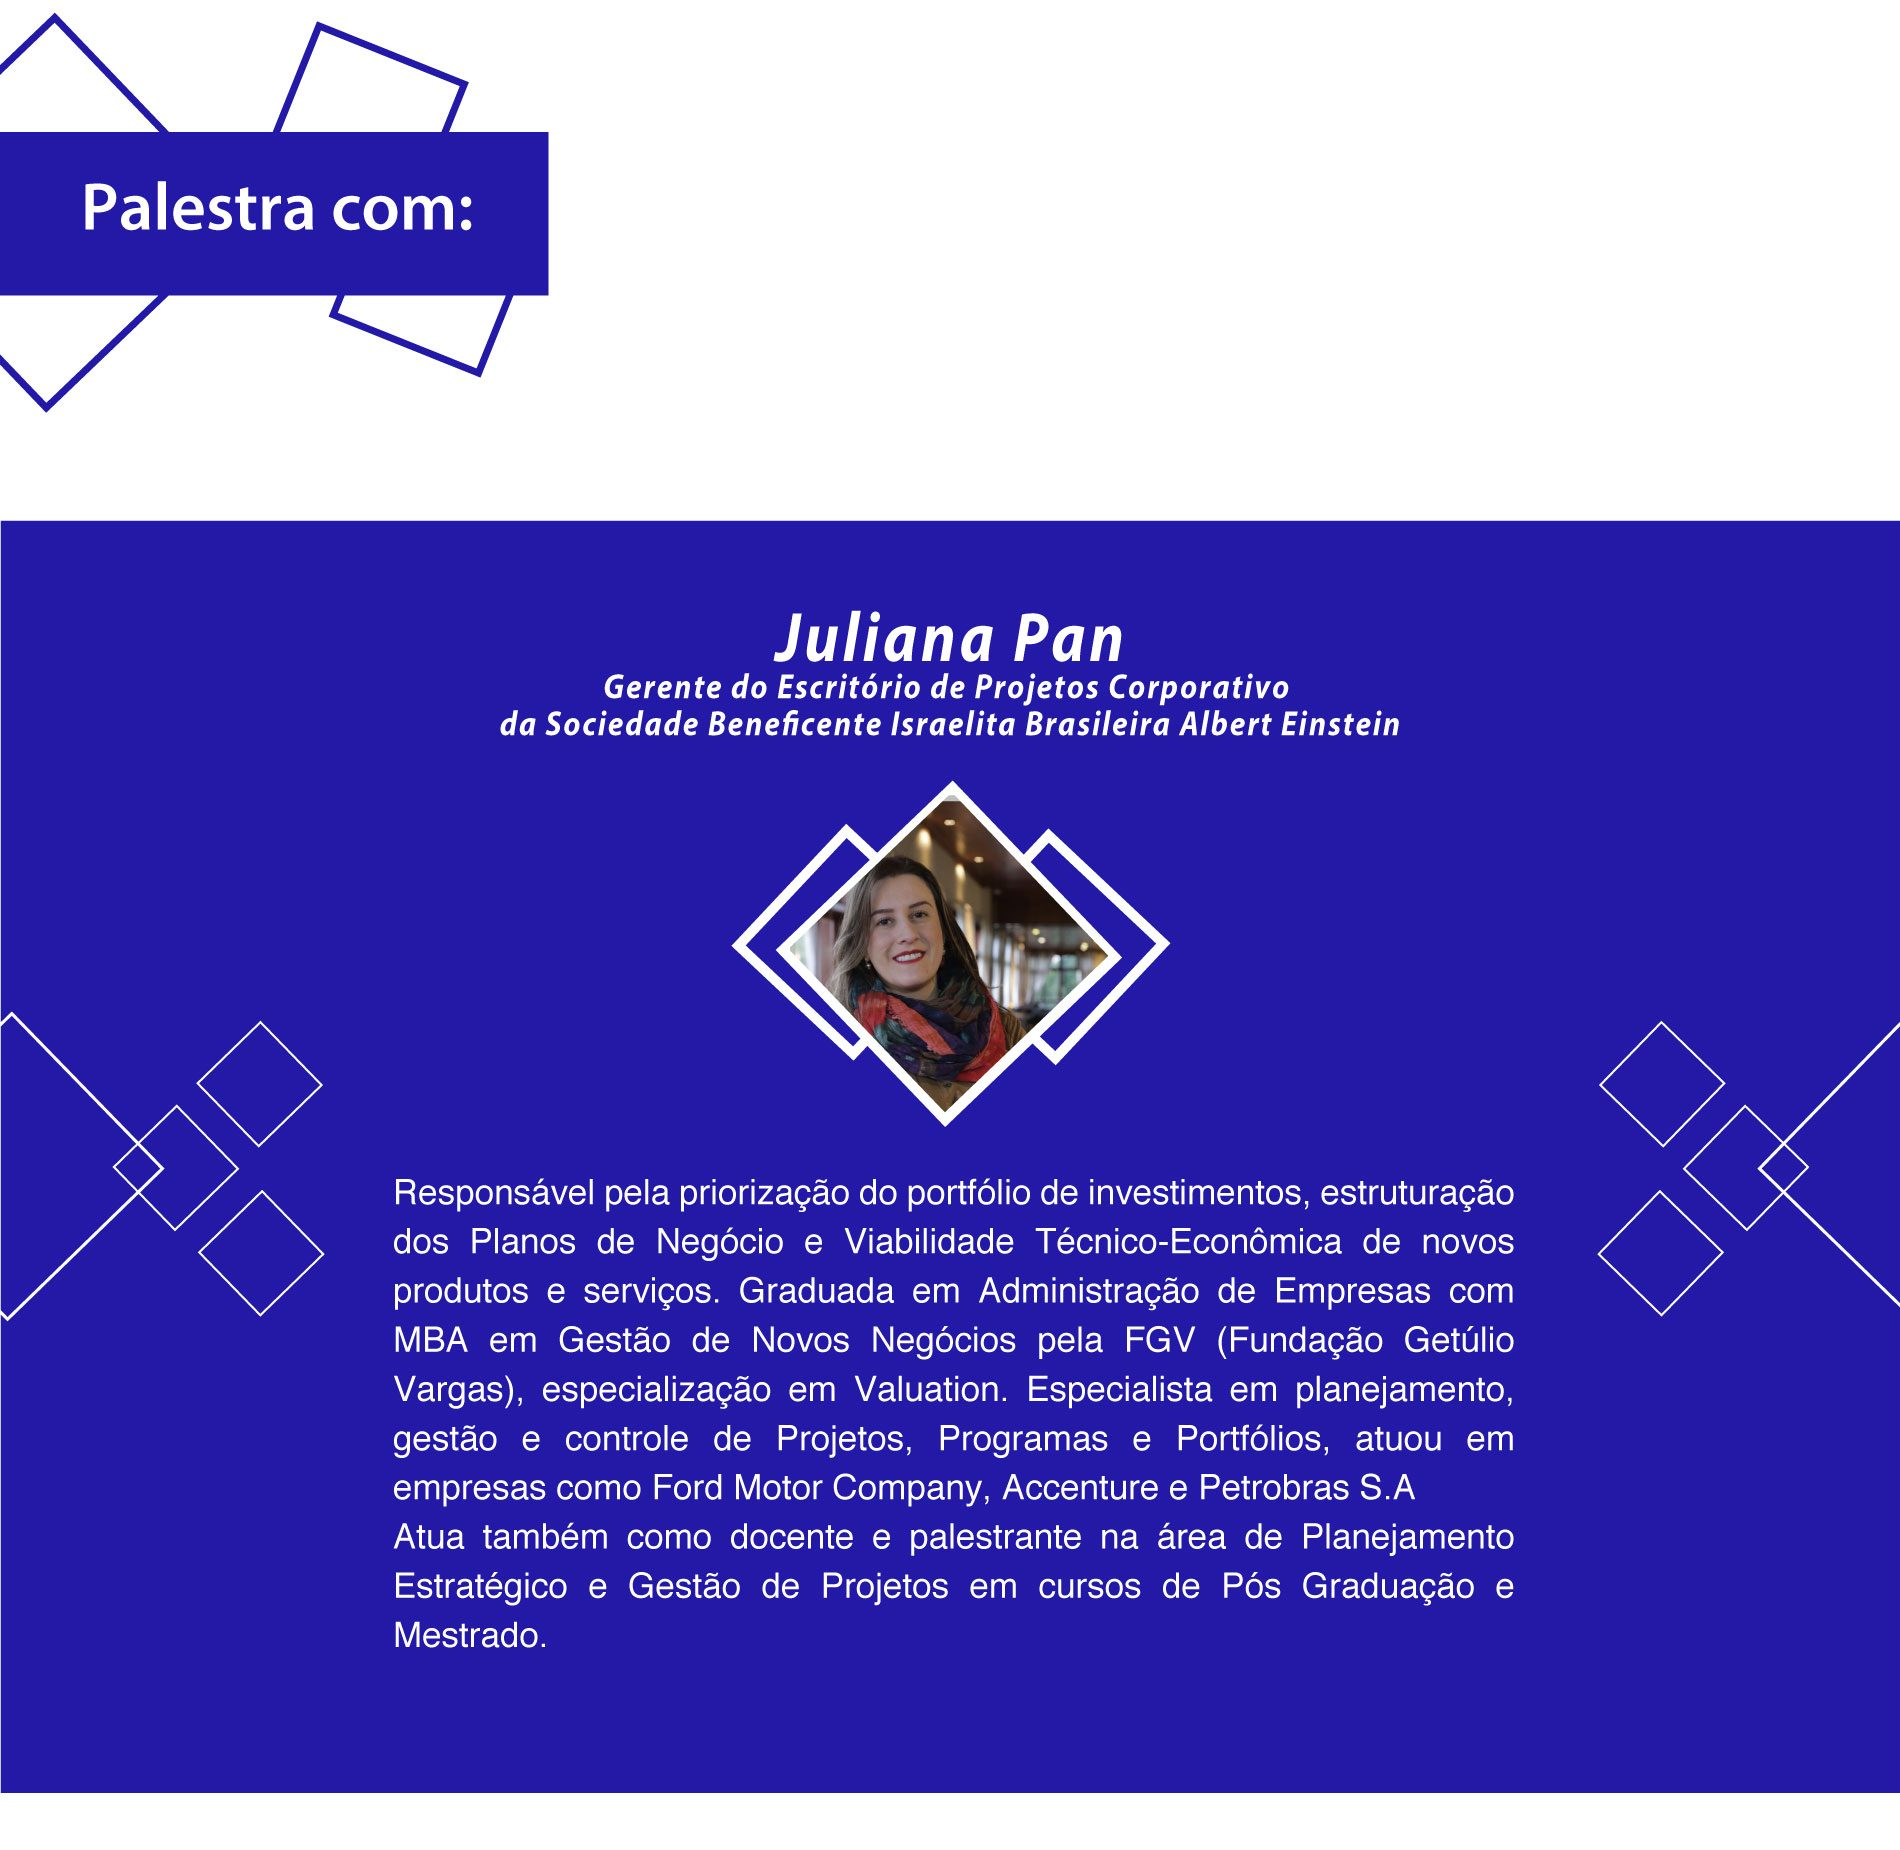 https://www.mestregp.com.br/wp-content/uploads/2018/03/Pagina-PeP-pt3-1900x1850.jpg